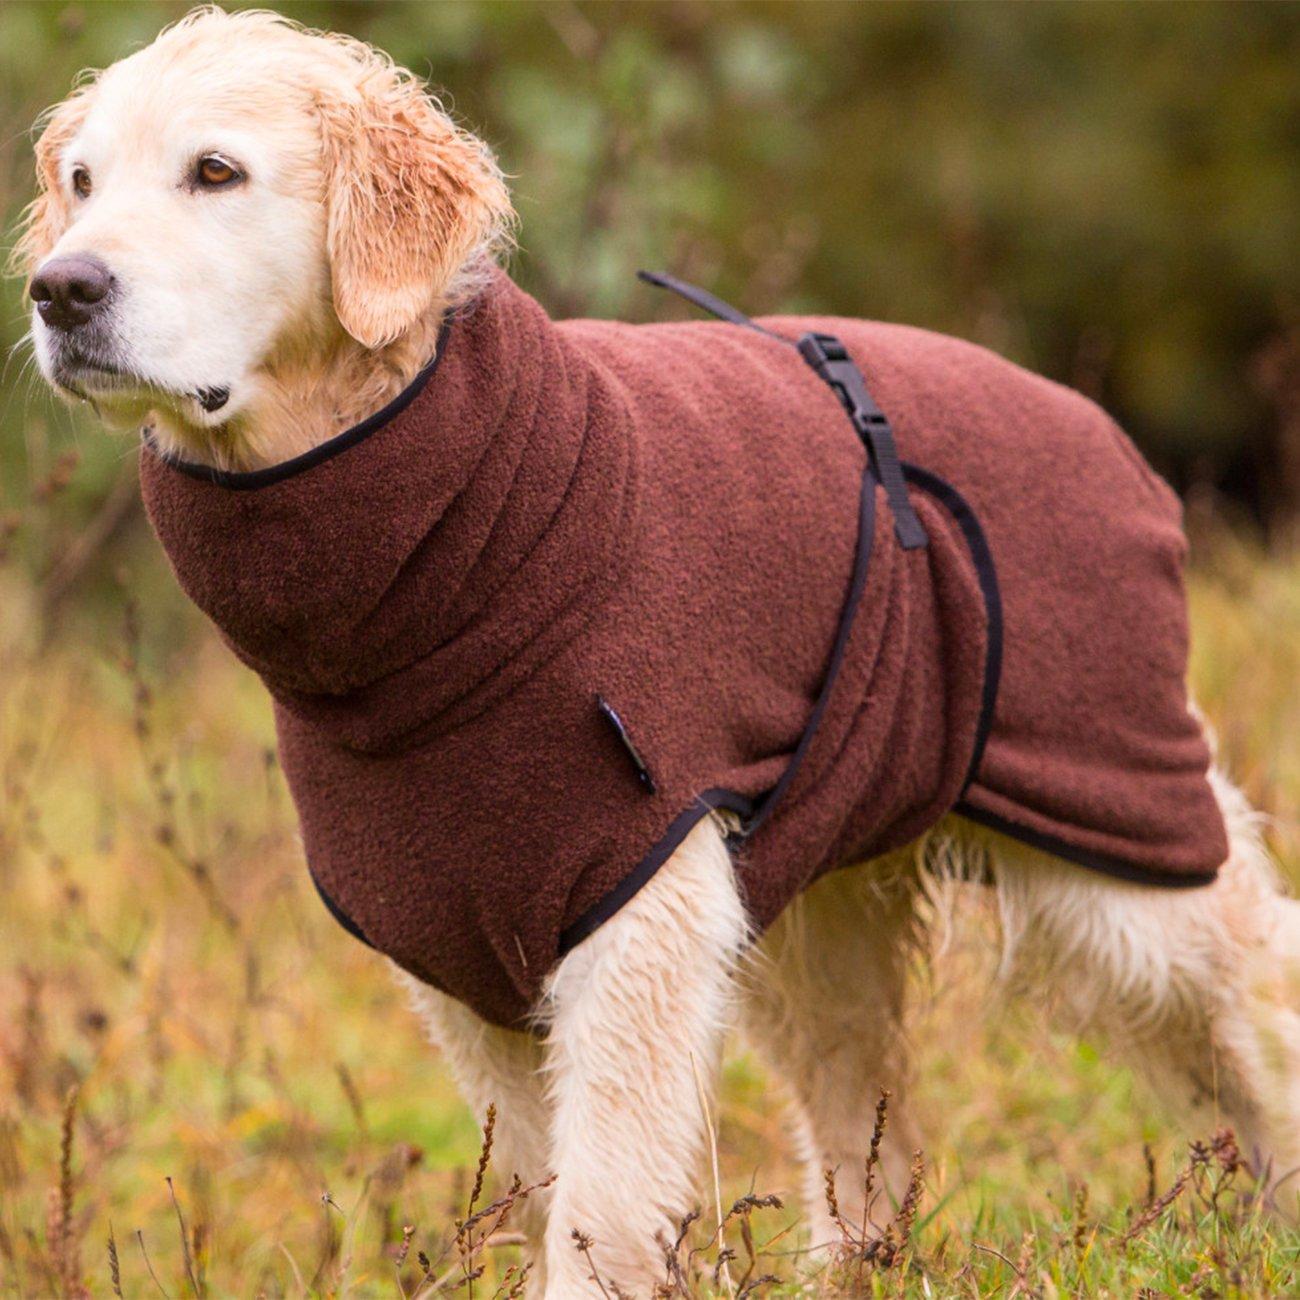 fit4dogs Trockenmantel Hund Dryup Cape, Bild 13